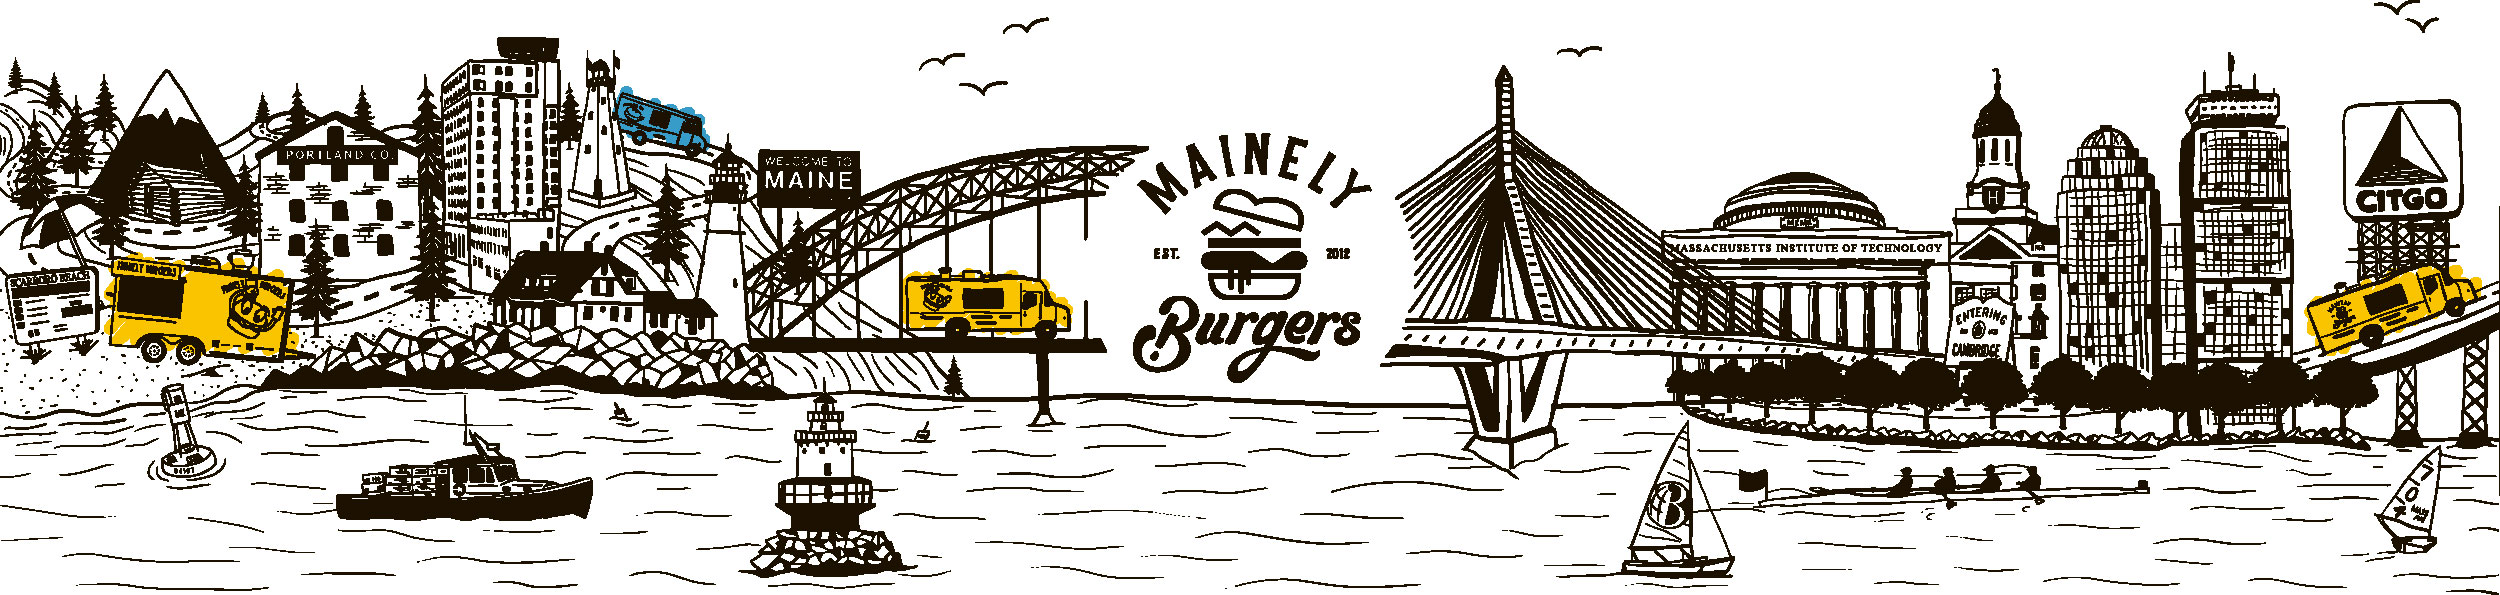 Mainely-Burgers-Mural.jpg